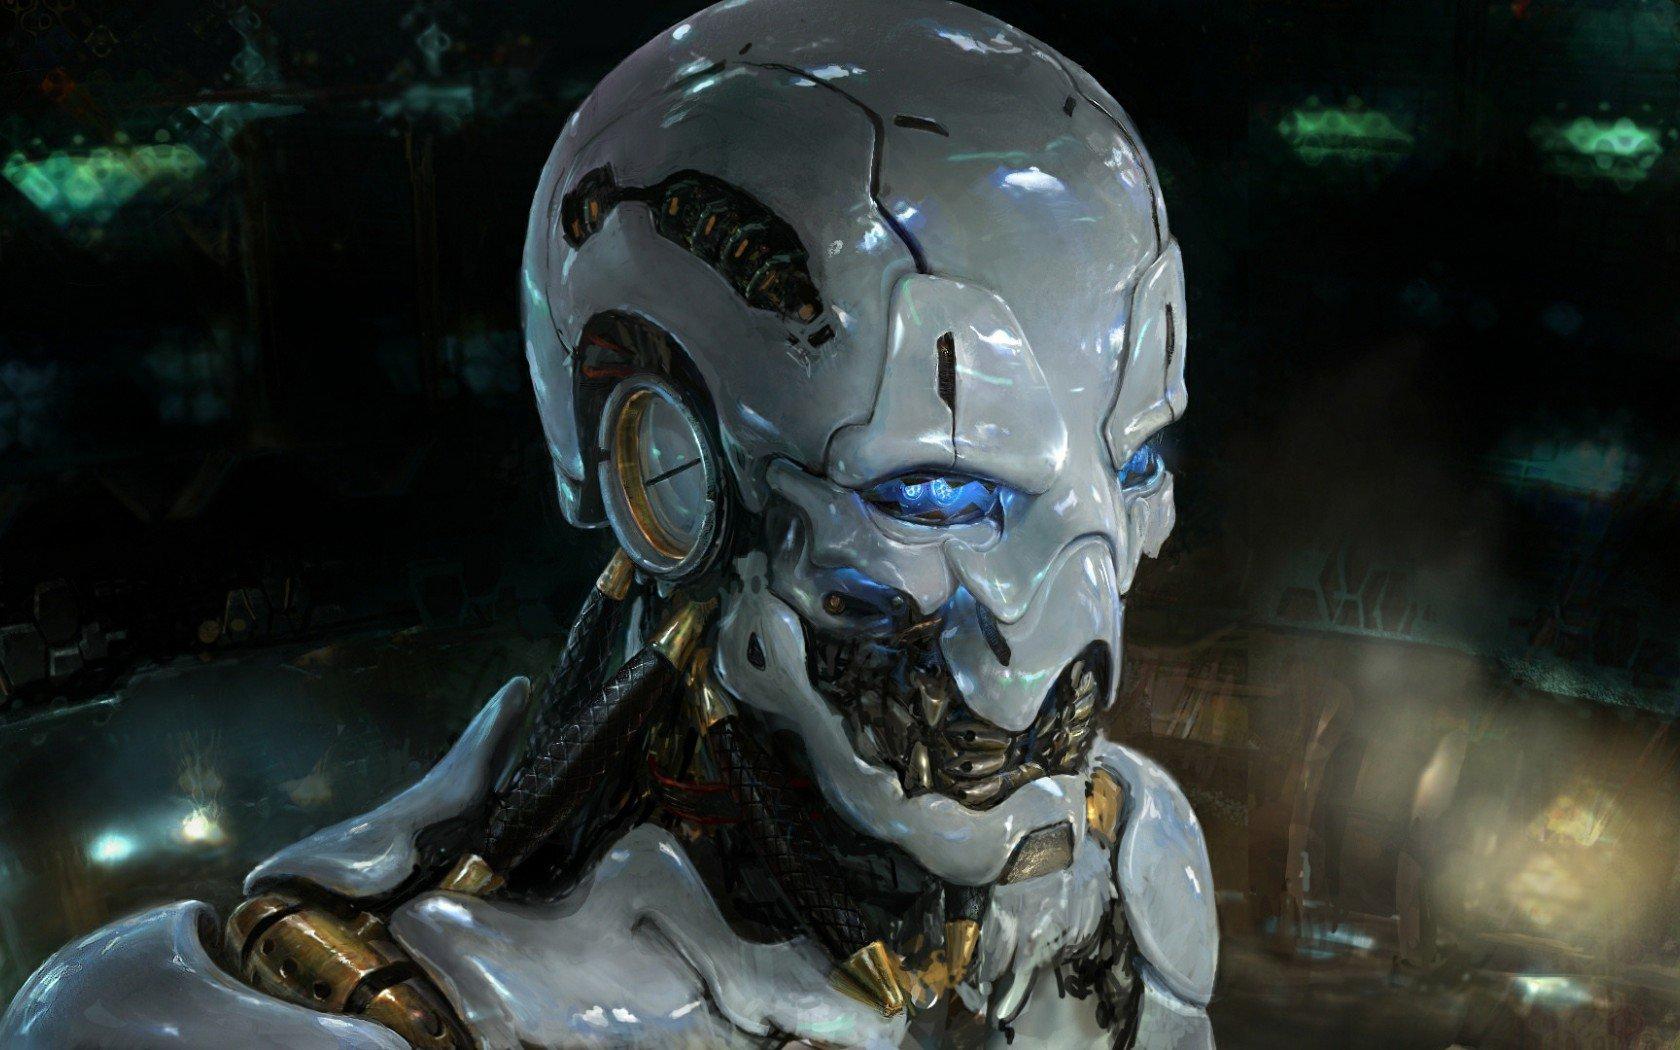 My Log Home 3d Live Wallpaper Blue Eyed Skull Robot Myconfinedspace